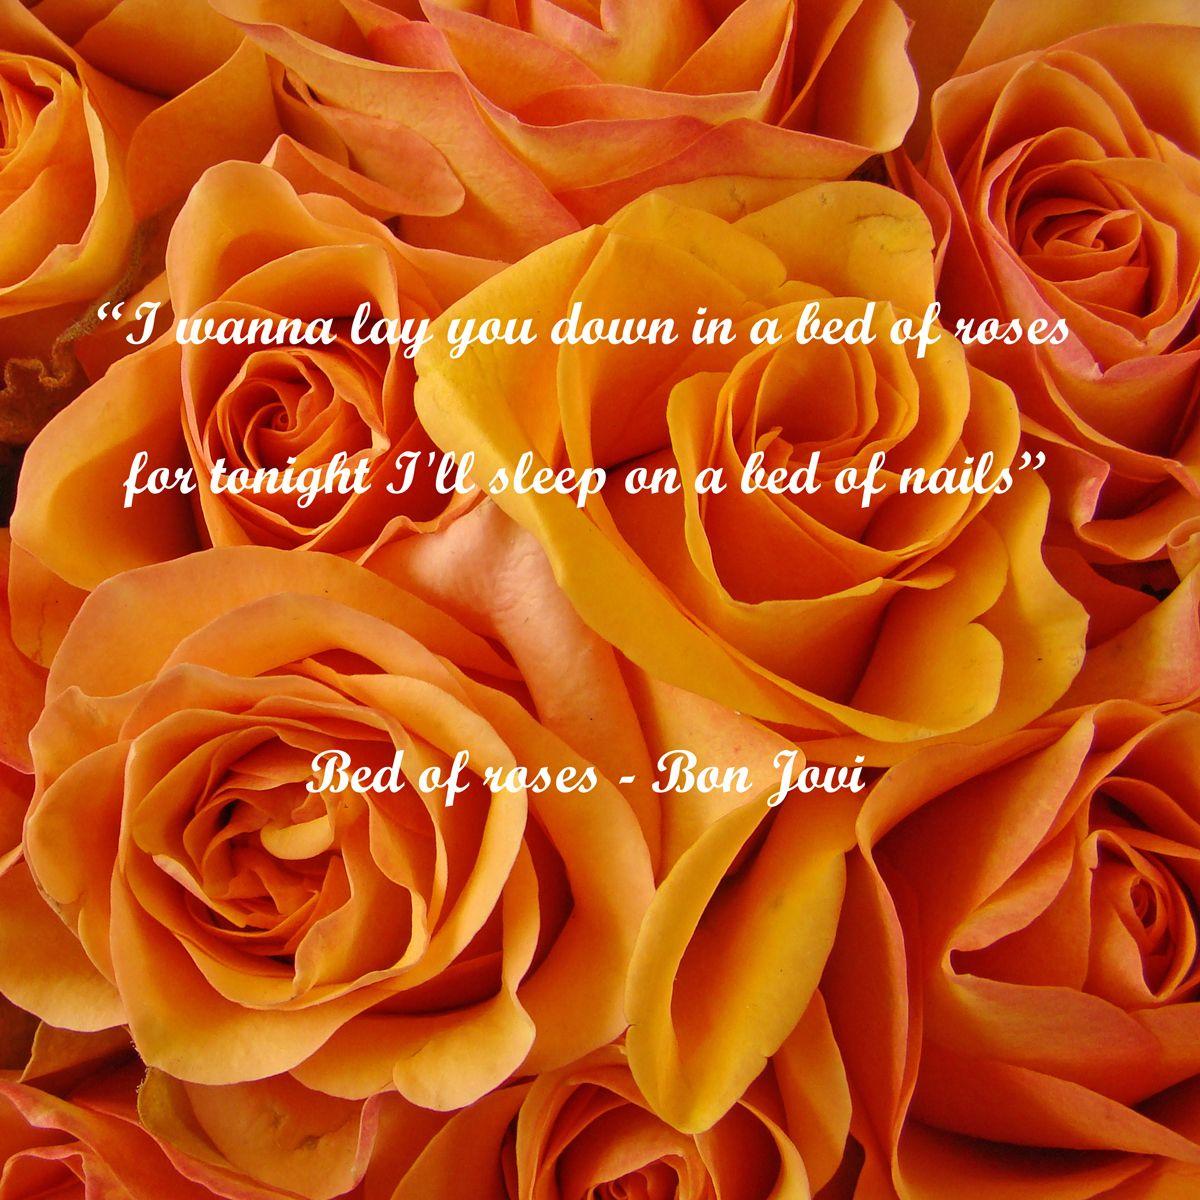 Bed Of Roses Bon Jovi Bed Of Roses Lyrics Roses Lyrics Bon Jovi